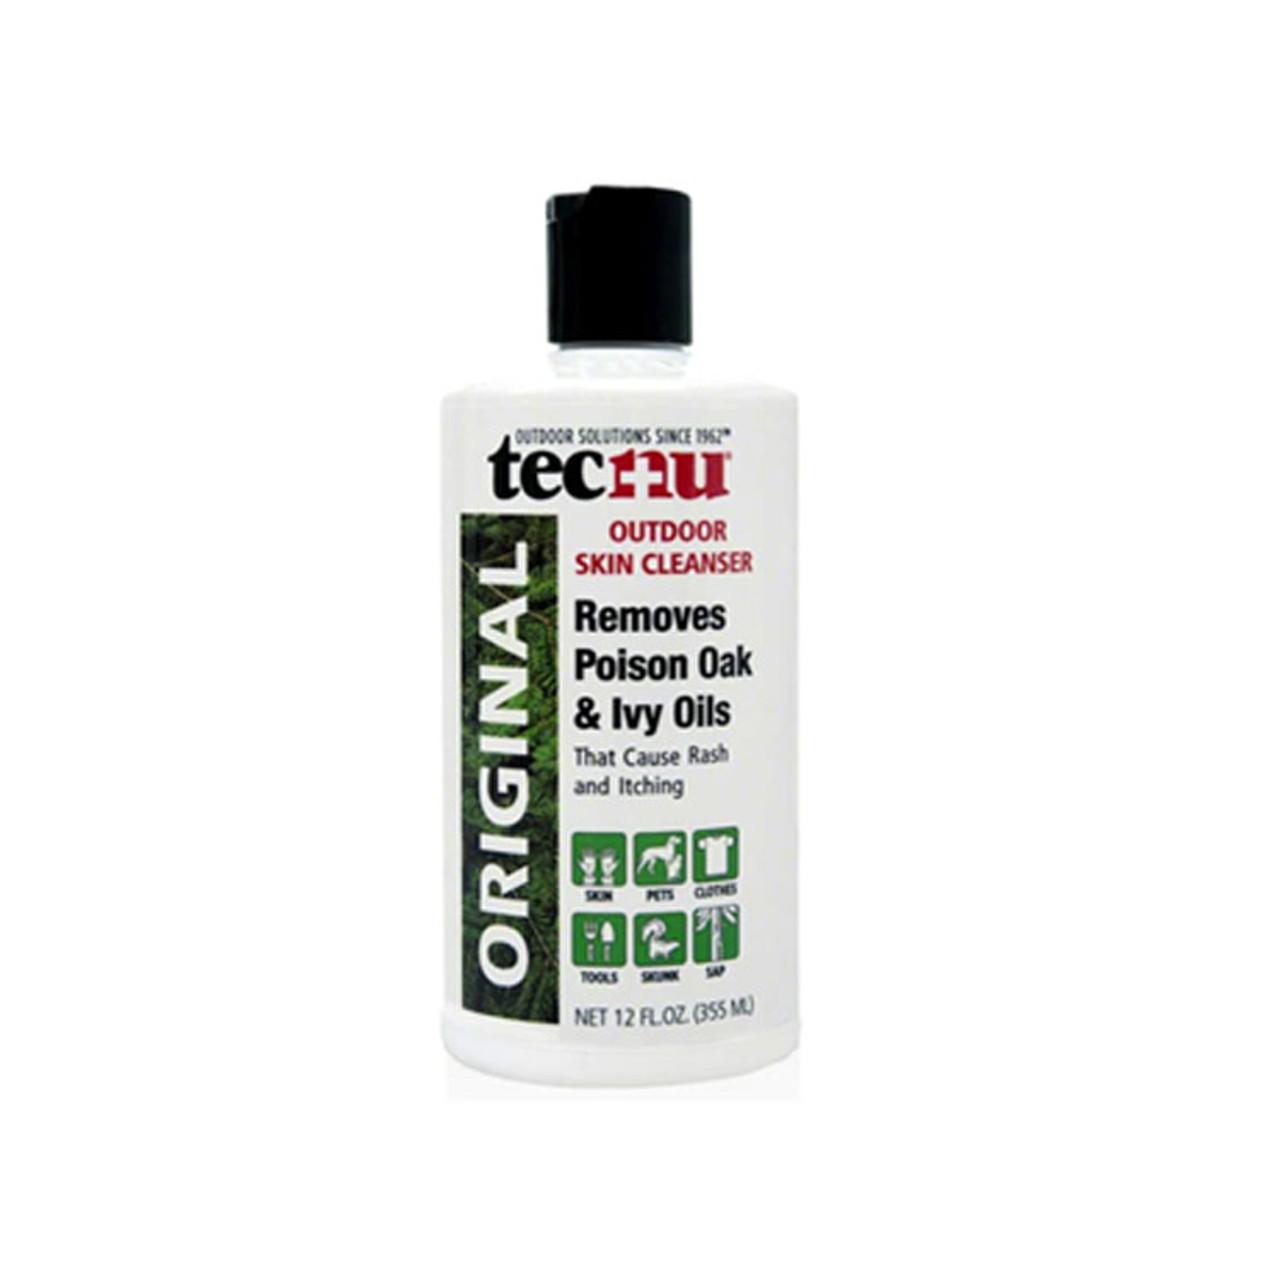 Tec Labs Tecnu Original Poison Ivy Cleanser